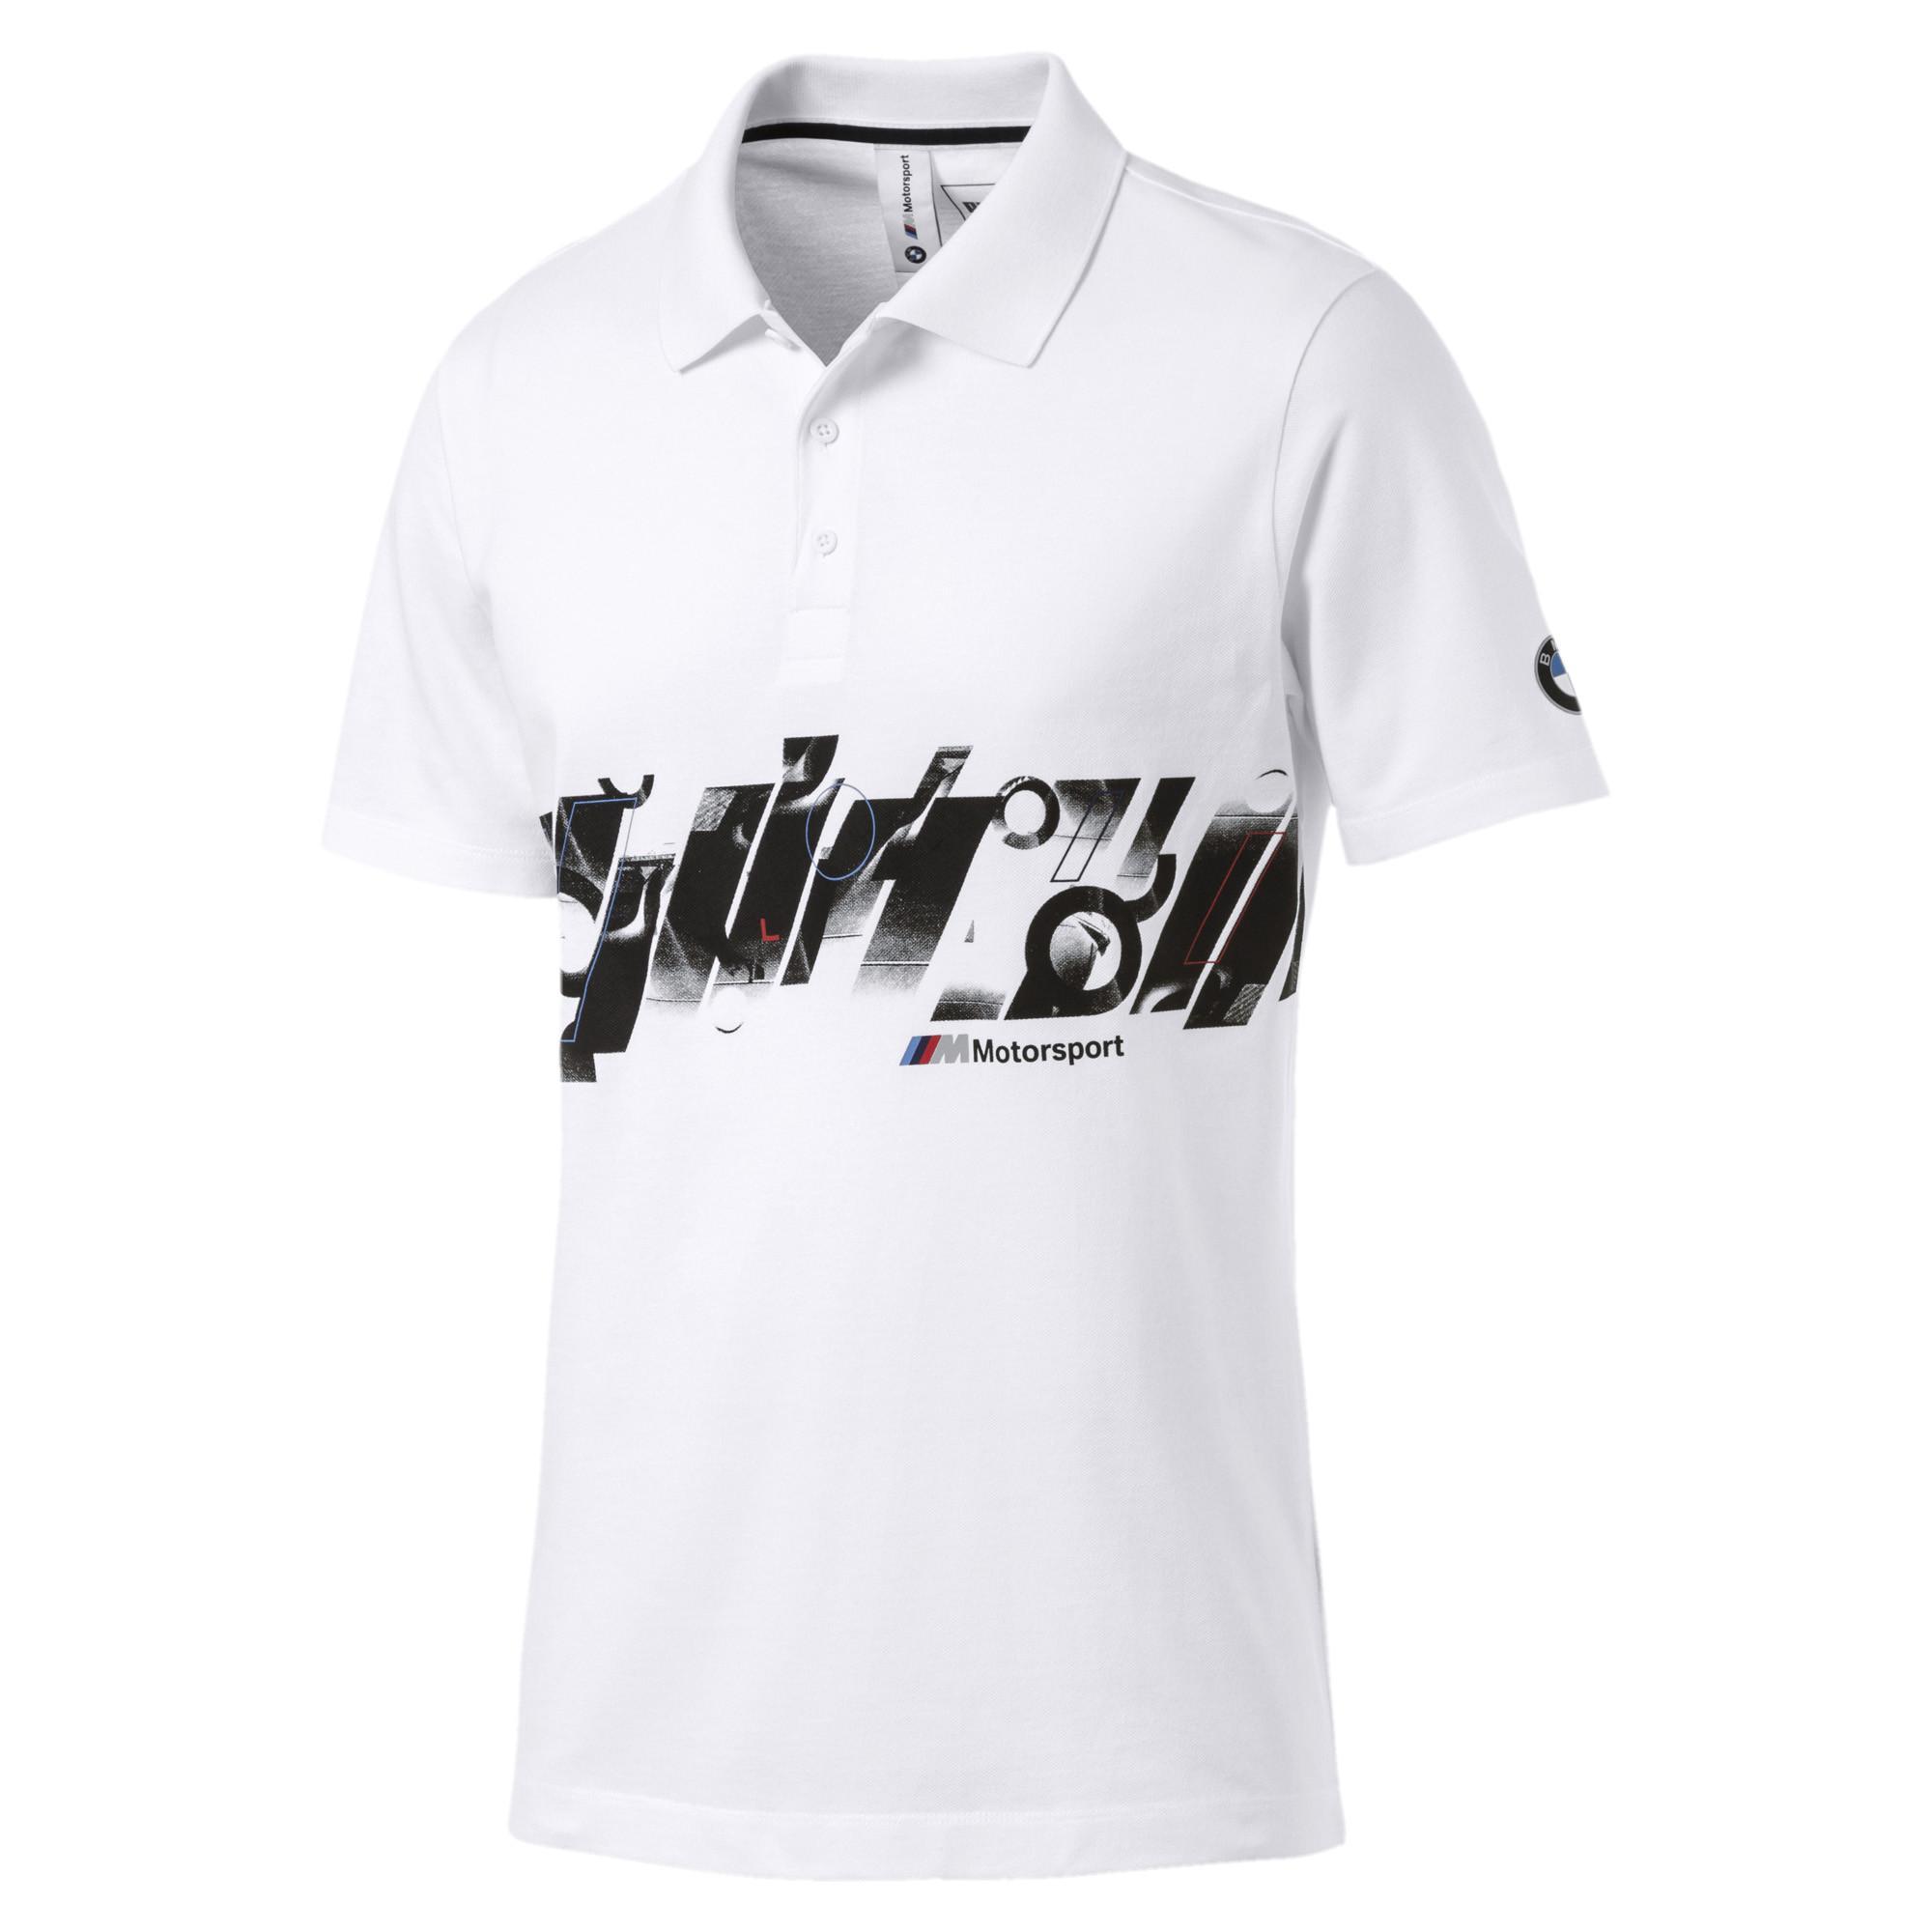 99c24df32e0 Lyst - Puma Bmw Mms Graphic Polo in White for Men